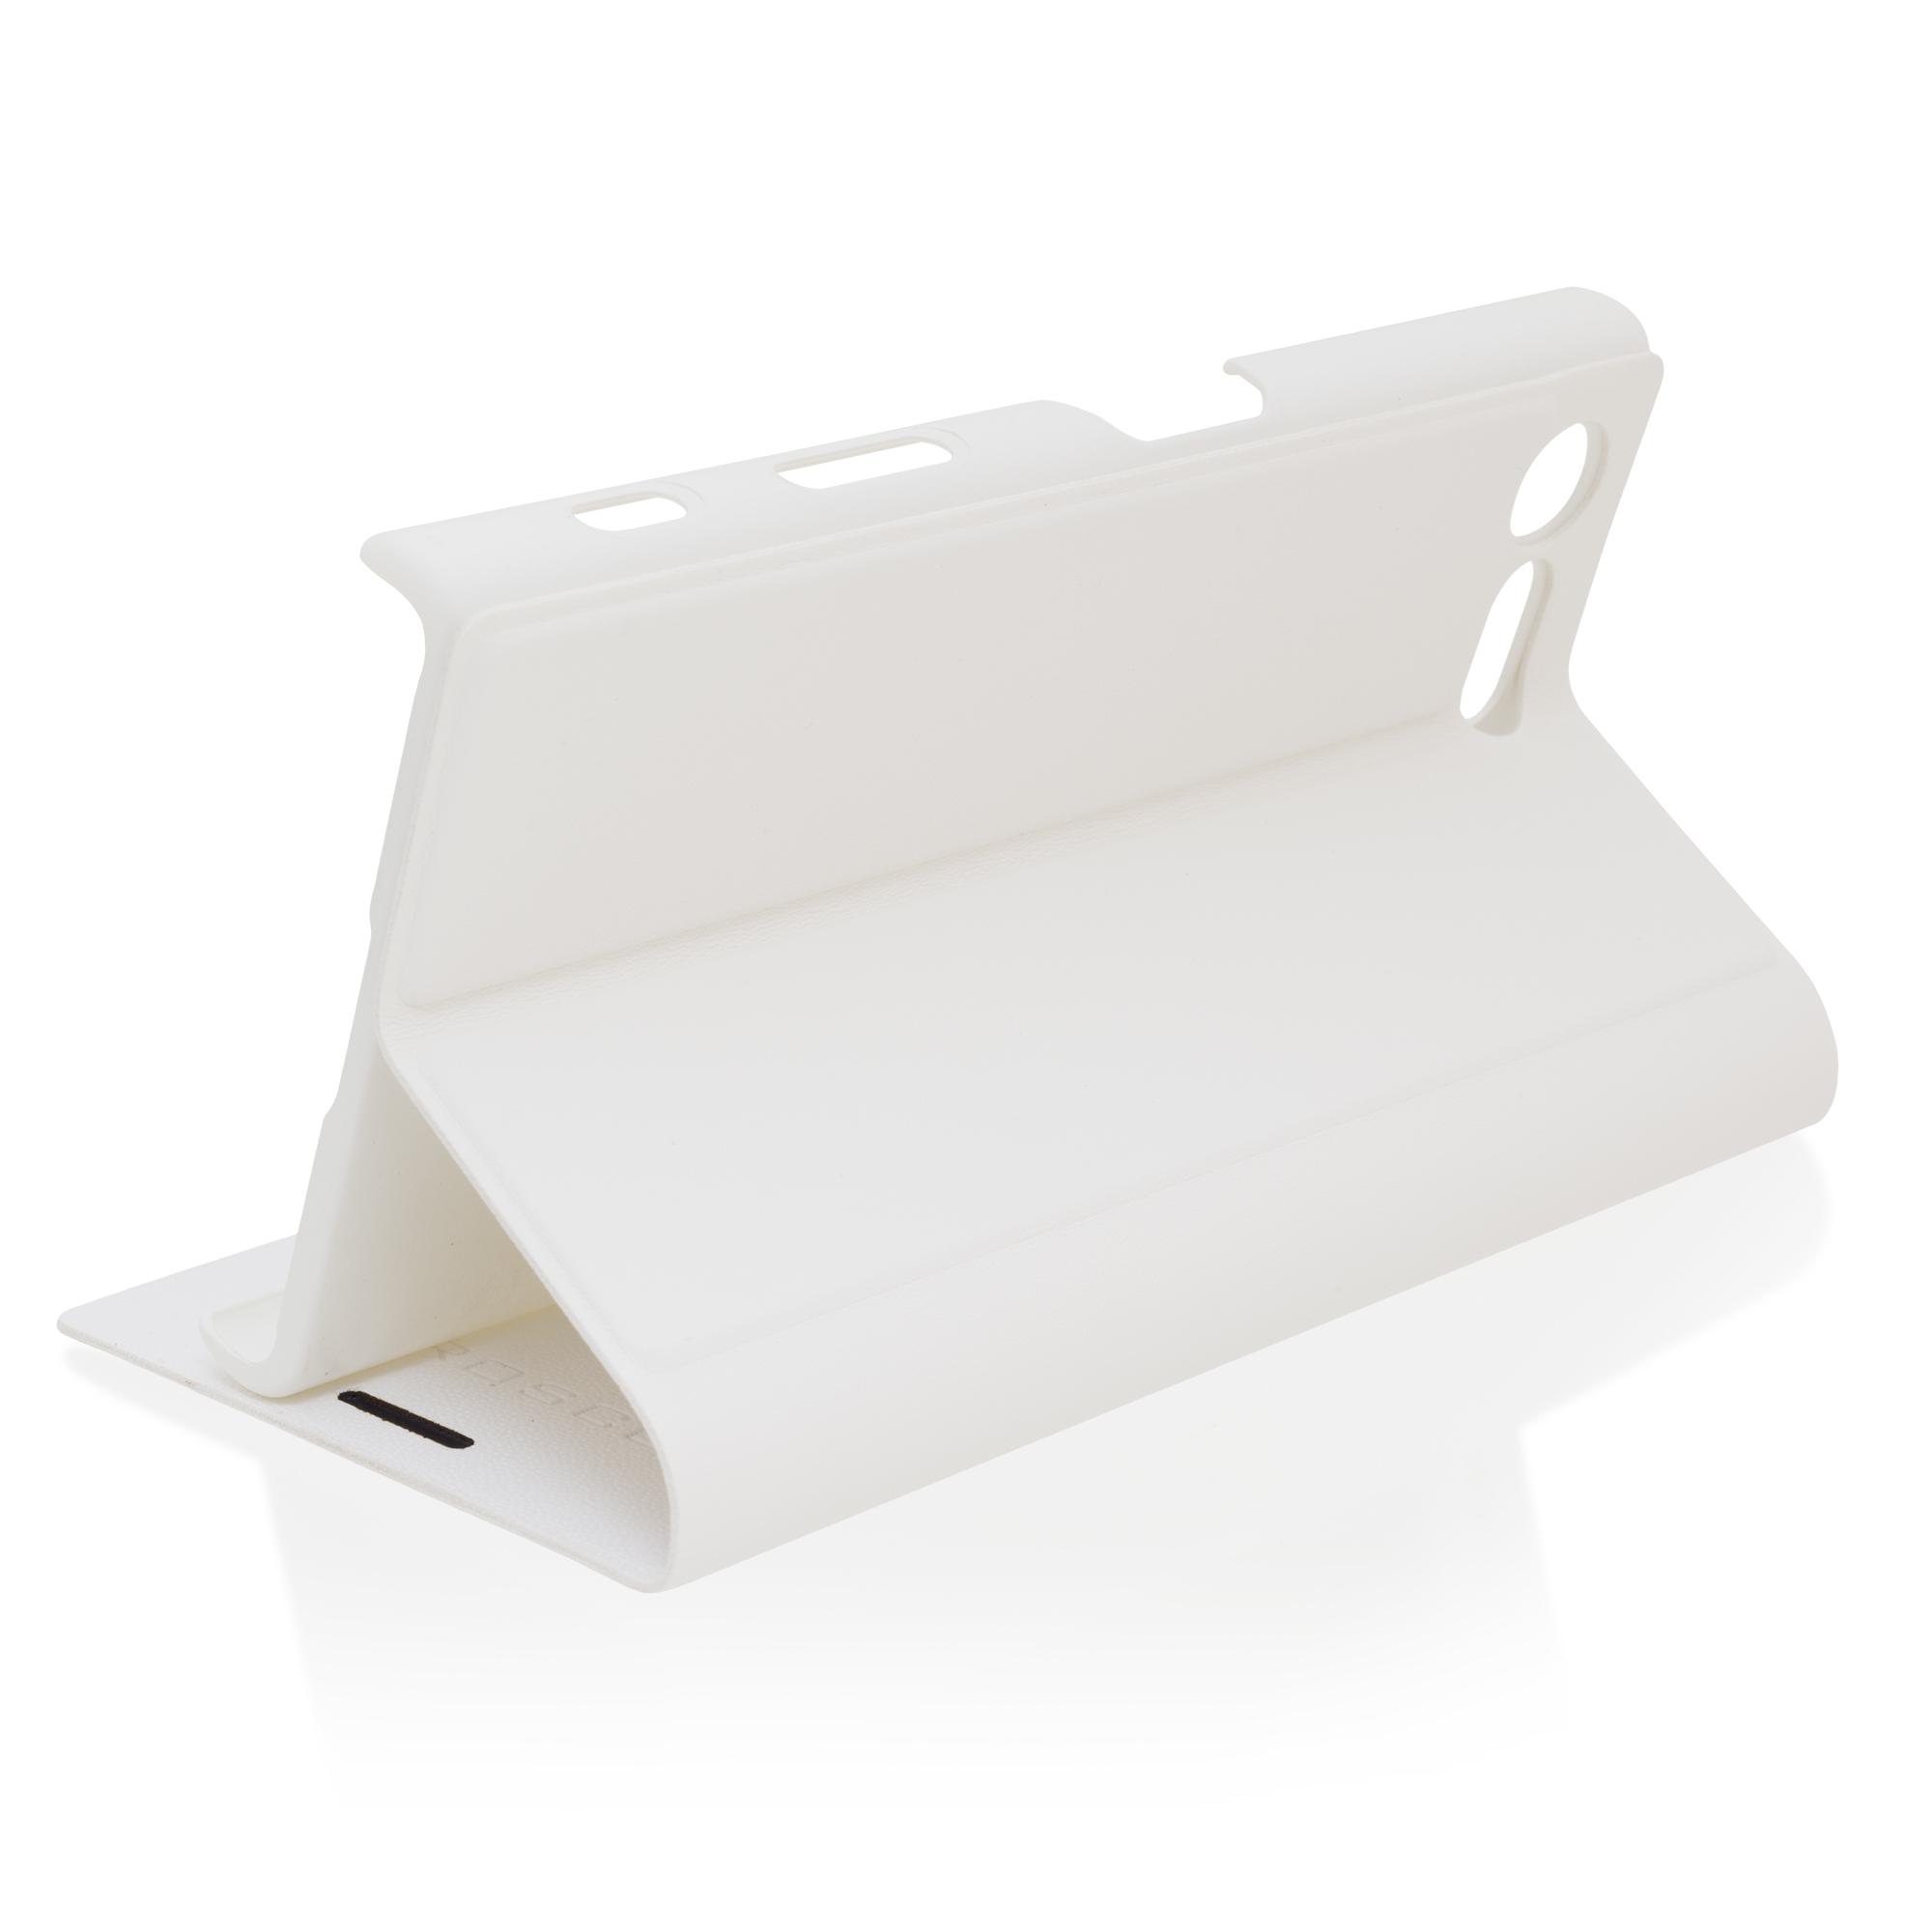 Чехол-книжка белого цвета для Xperia X Compact в Sony Centre Воронеж